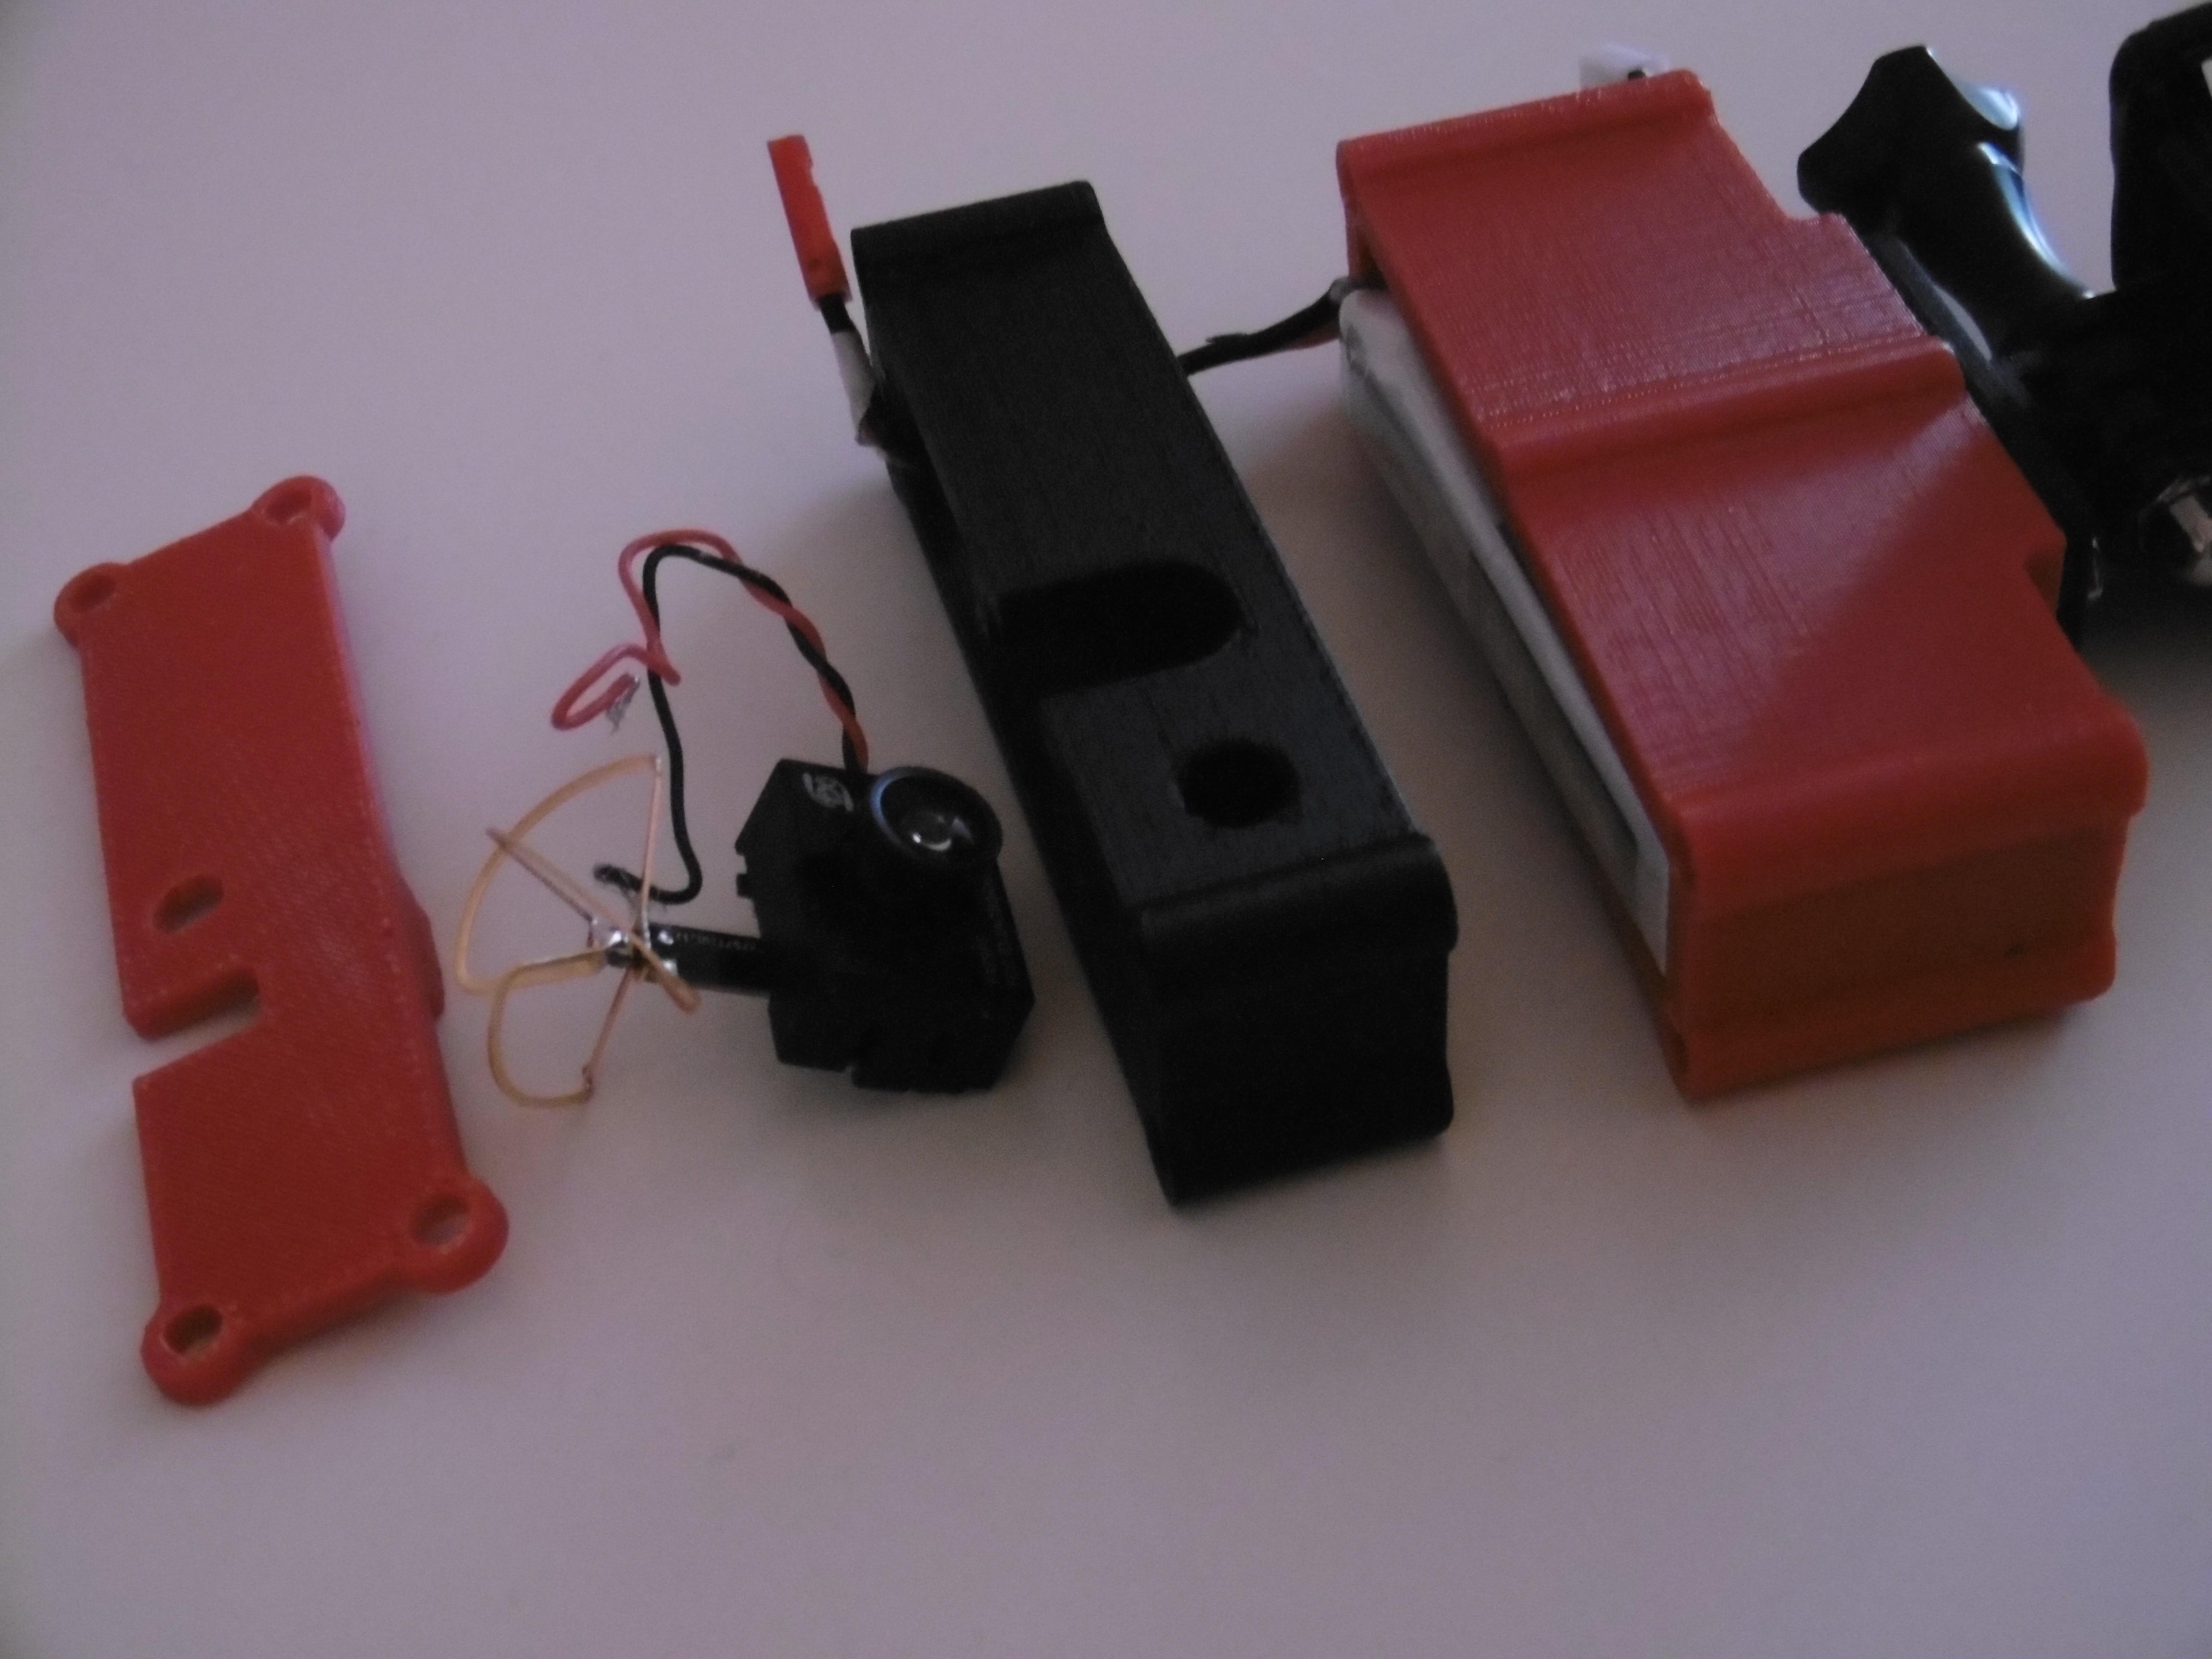 P1000959.JPG Download free STL file 5.8GHz Transmitter Holder with Miniature Camera • 3D printable object, JJB